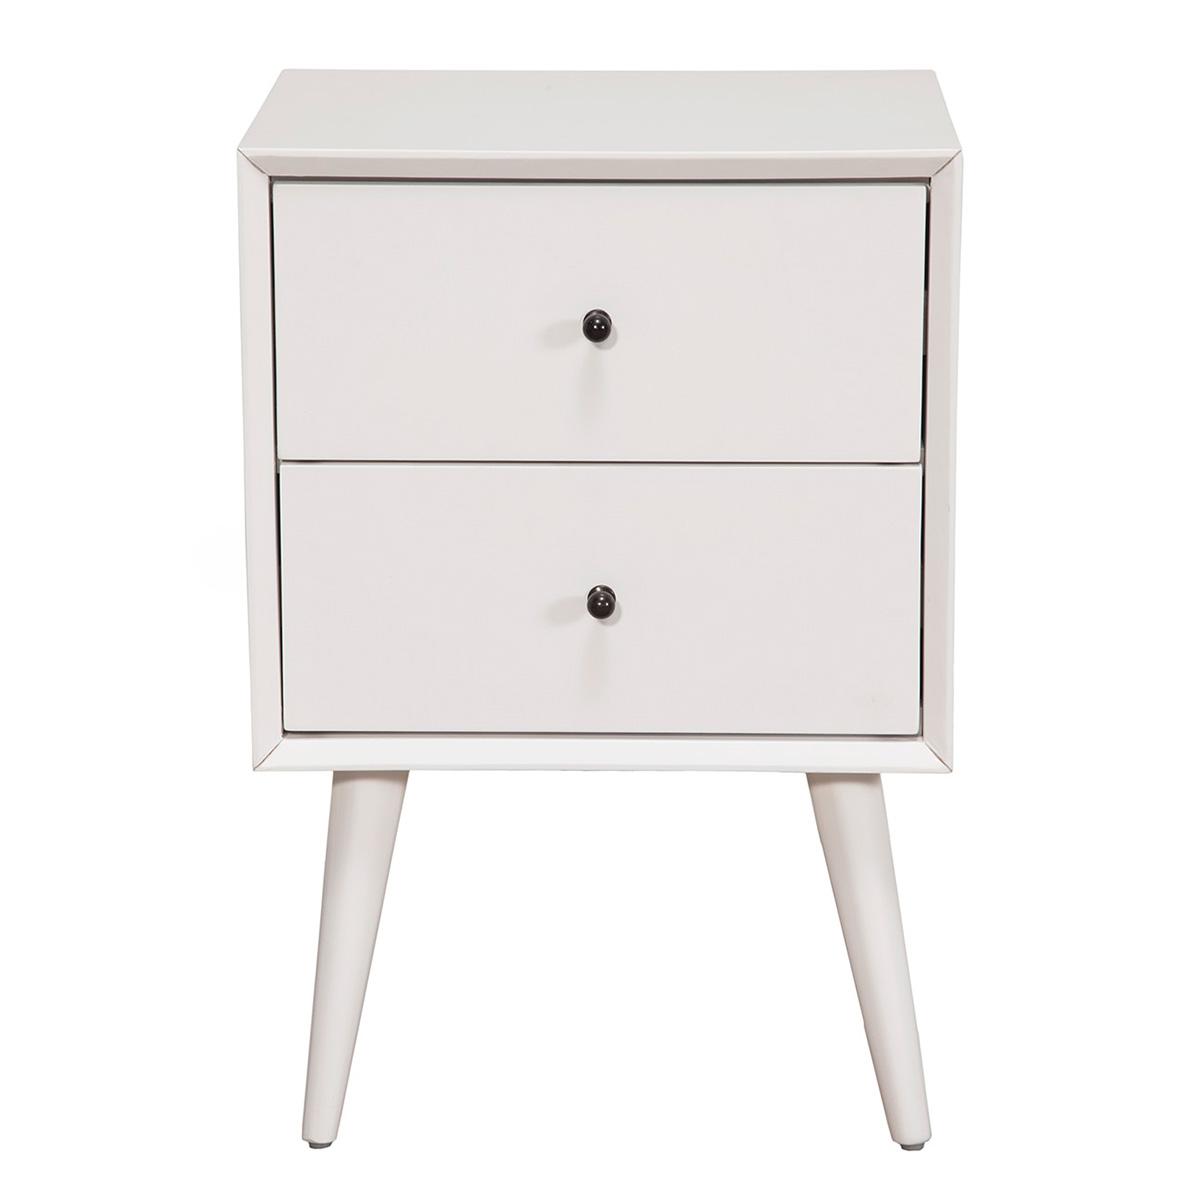 Exceptional Alpine Furniture Flynn Mid Century Modern 2 Drawer Nightstand In White  Finish